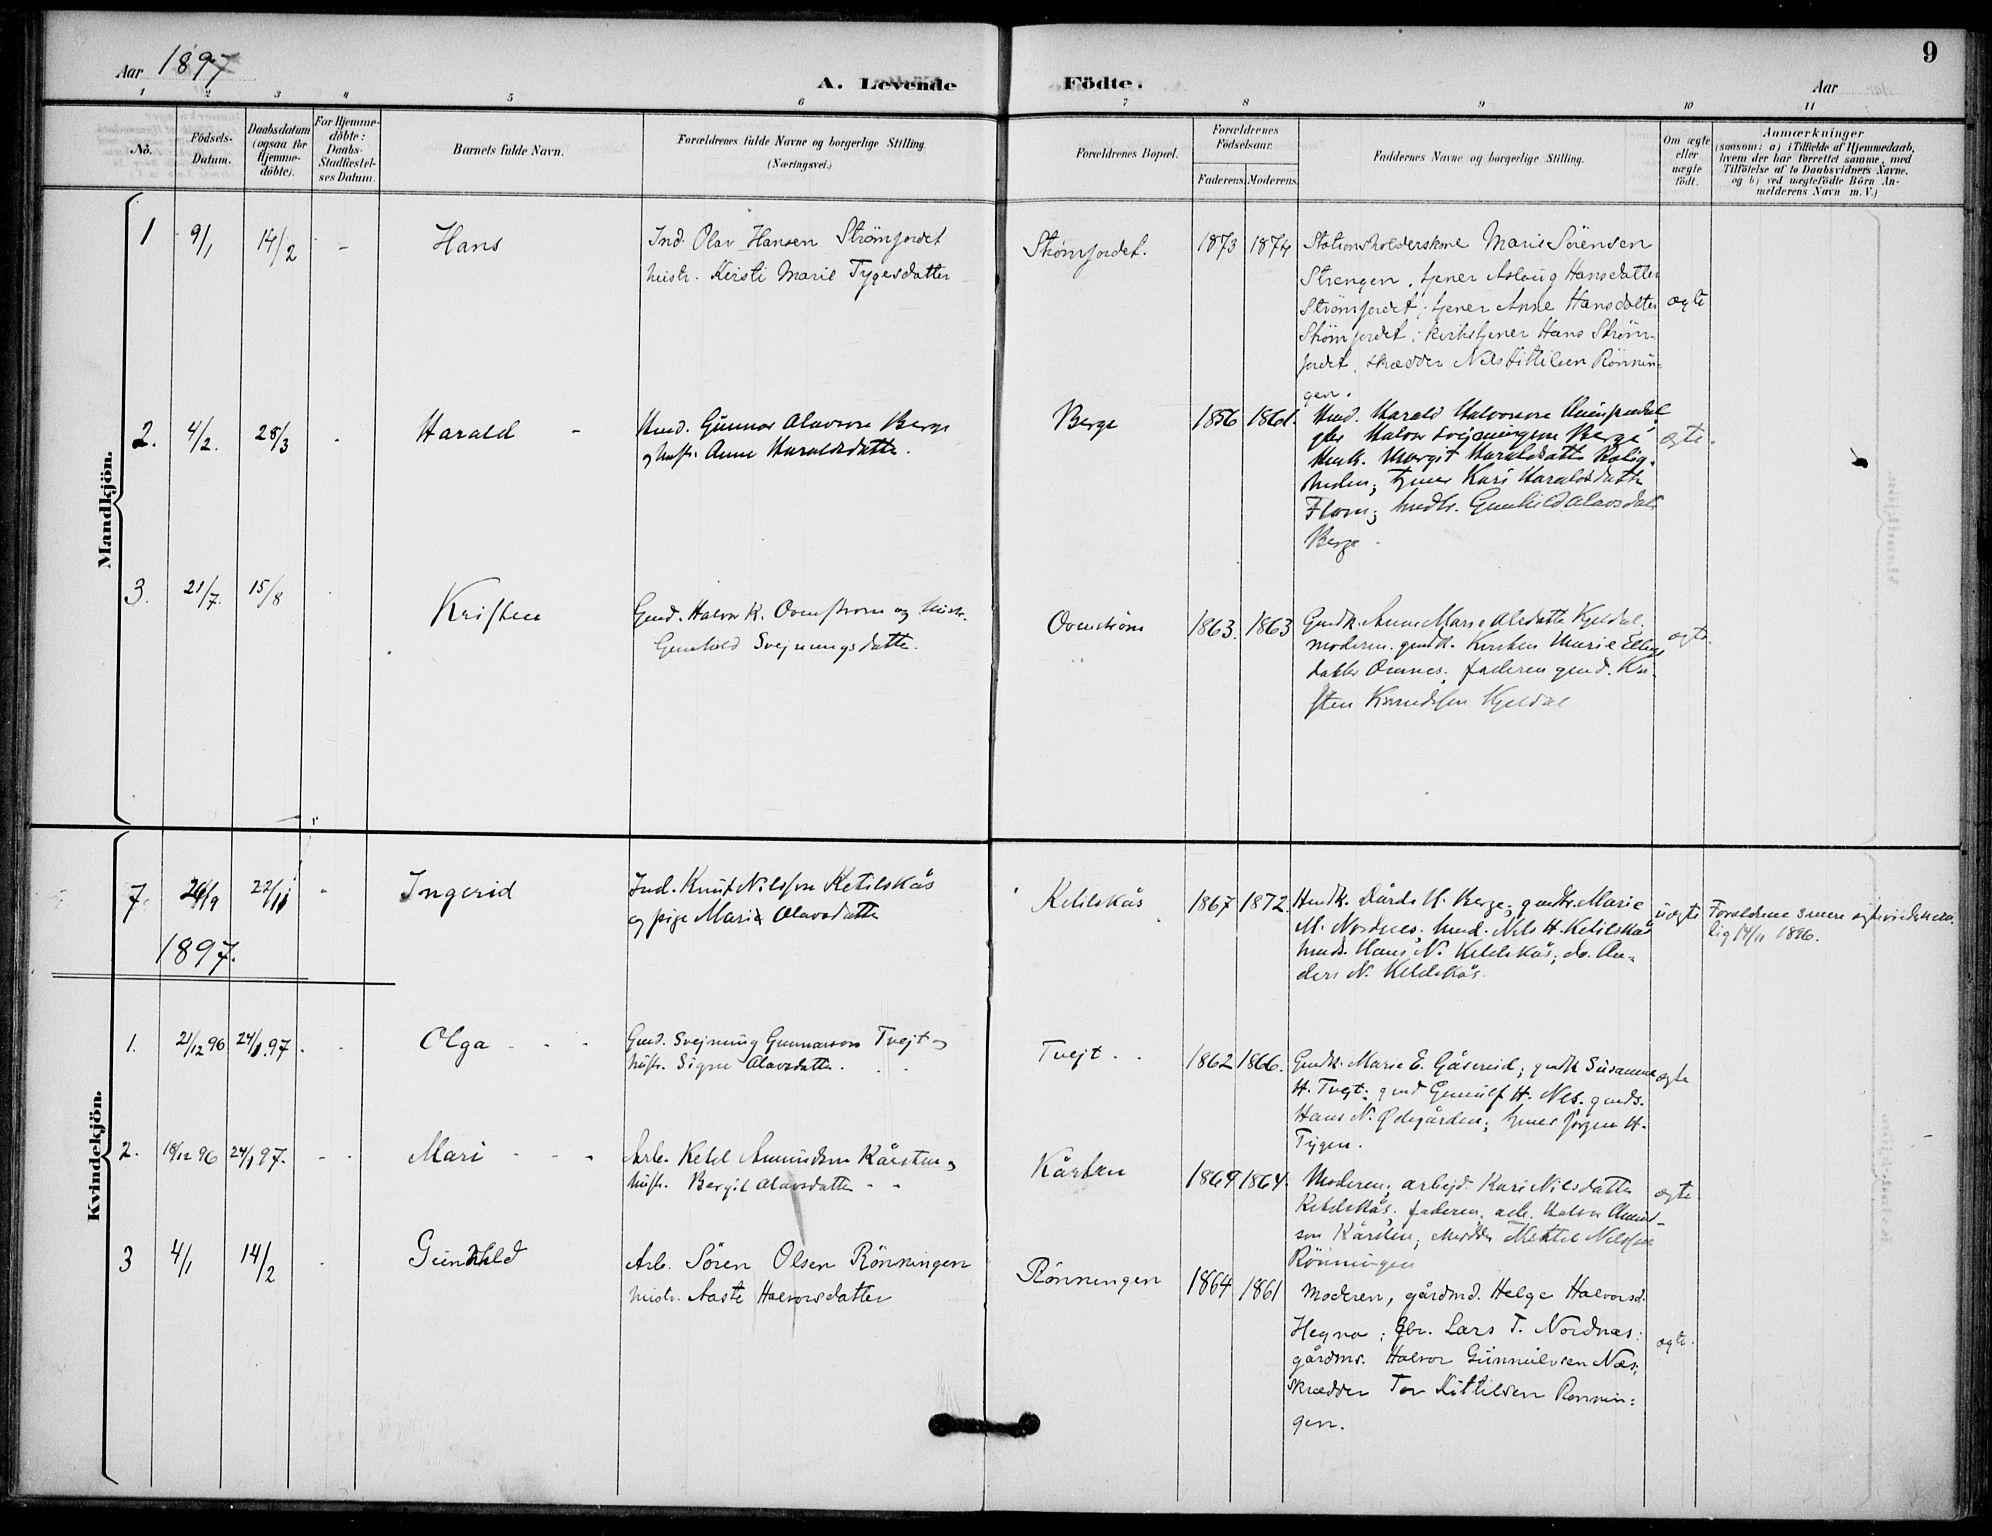 SAKO, Lunde kirkebøker, F/Fb/L0004: Ministerialbok nr. II 4, 1892-1907, s. 9